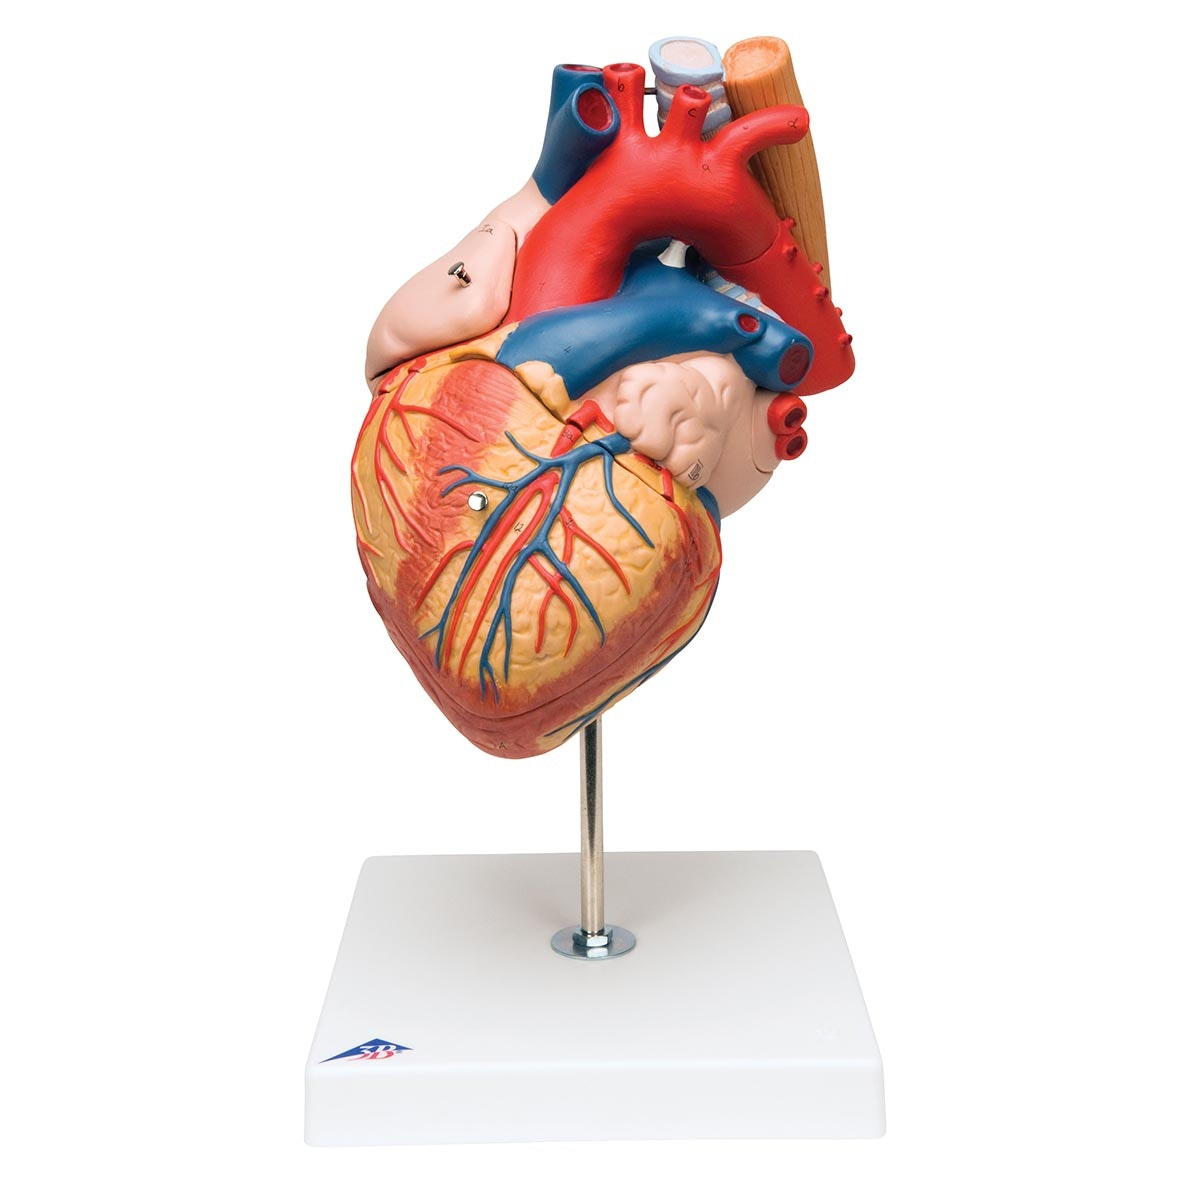 FORSTØRRET og håndmalet hjertemodel med luftrør og spiserør